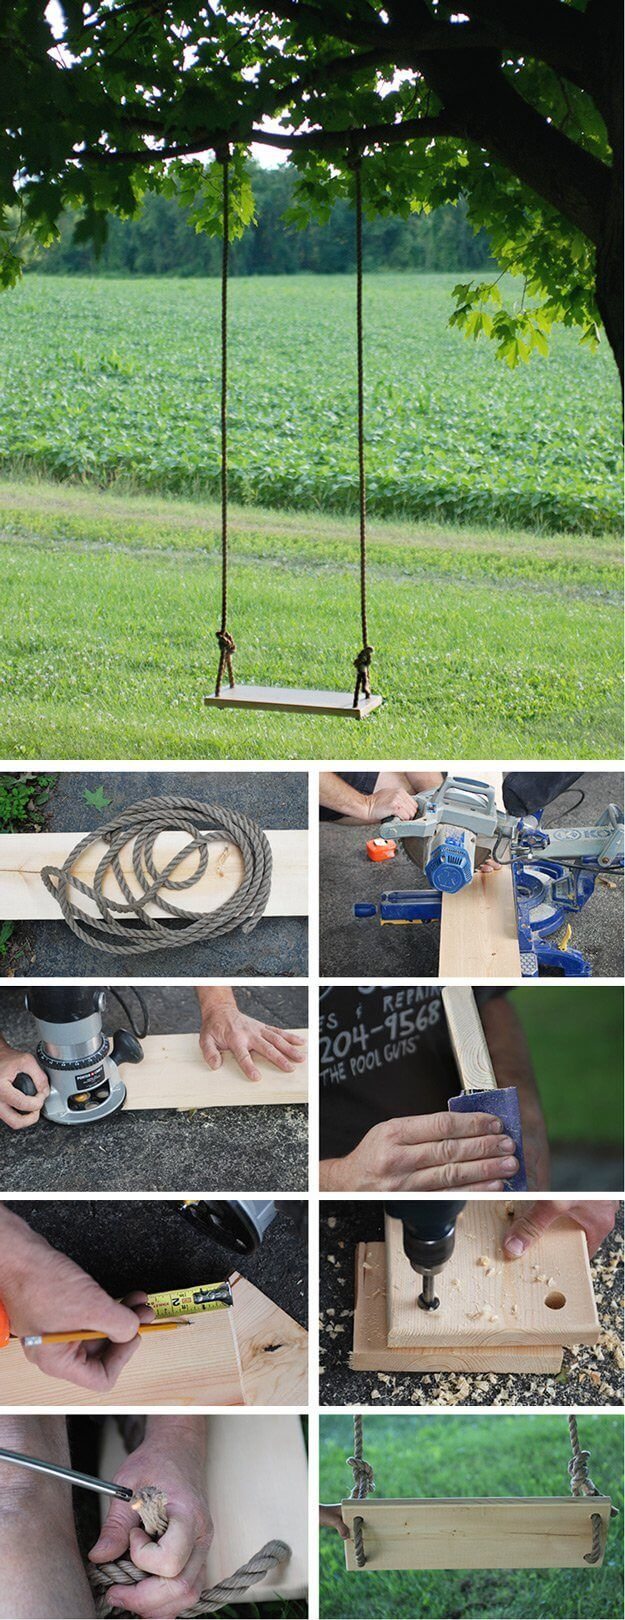 Simple Nostalgic DIY Rope Swing